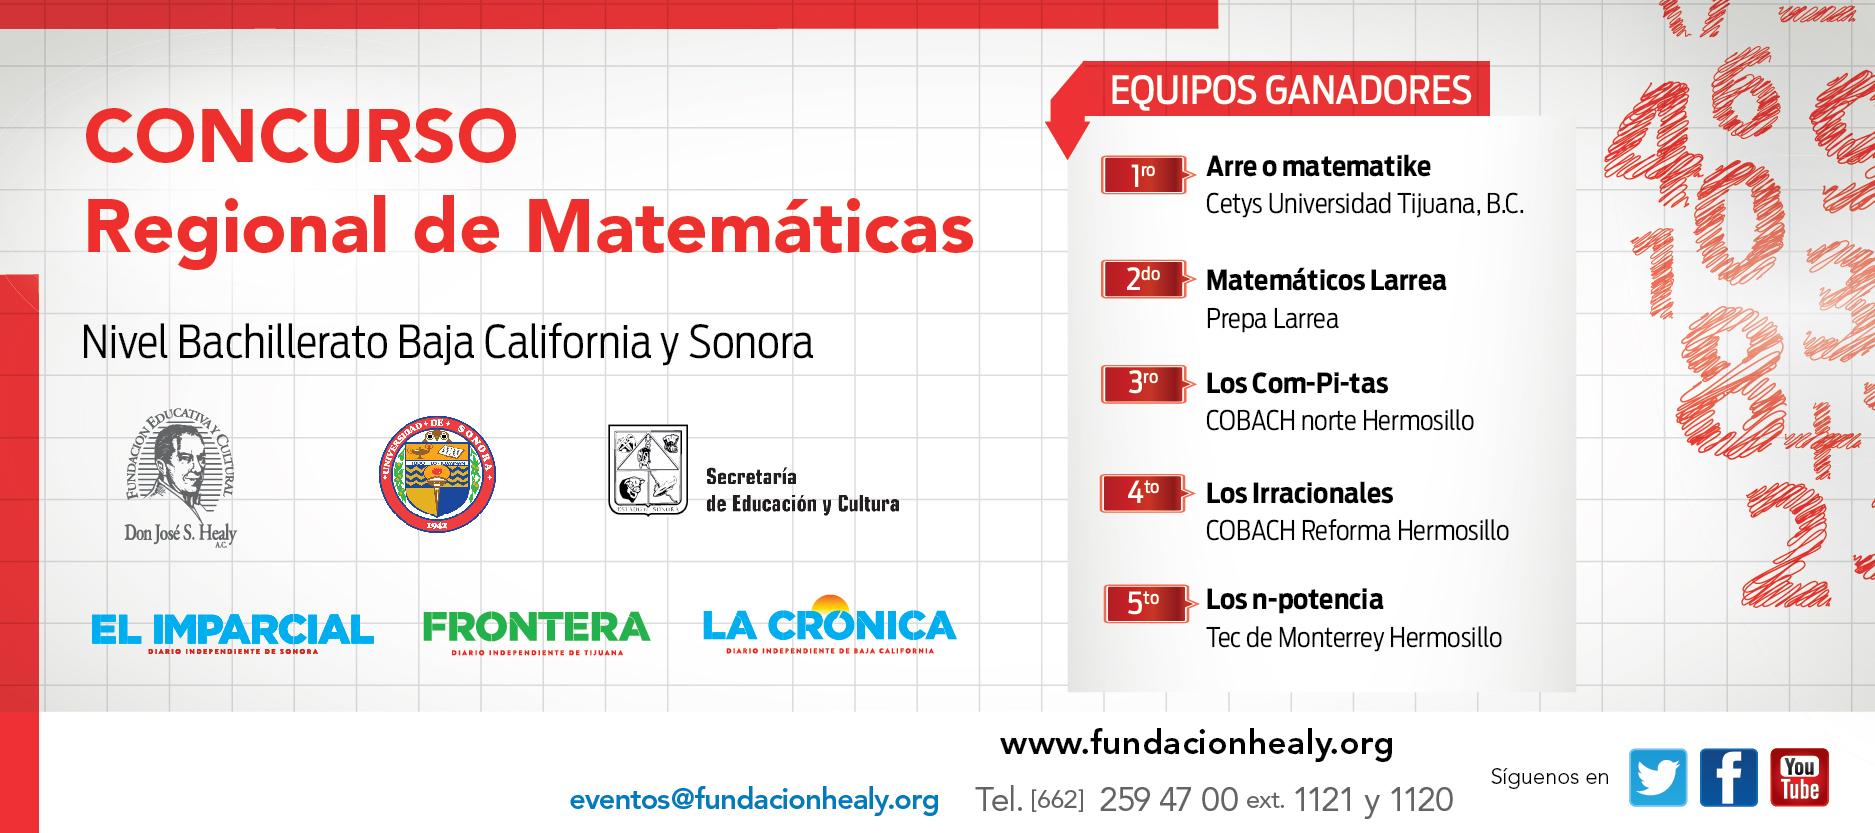 feature ganadores matematicas-01